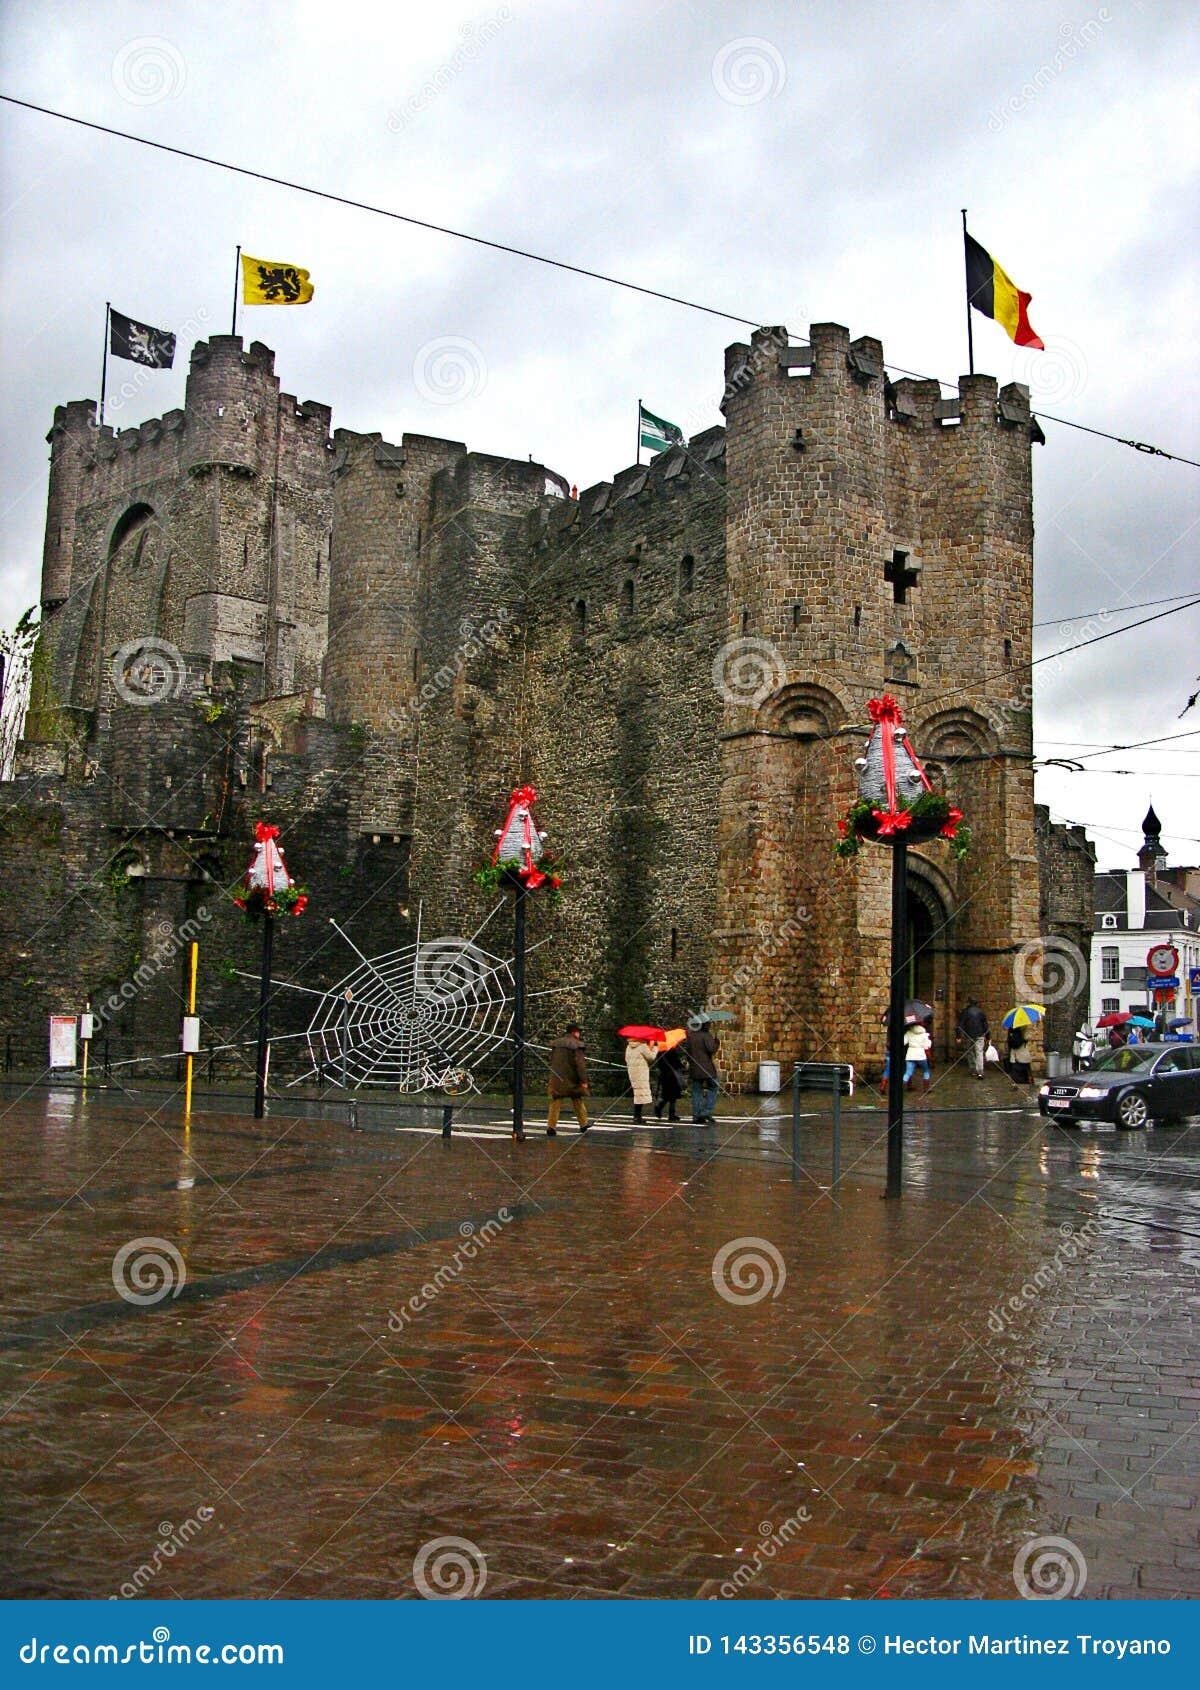 Castle της Γάνδης, Βέλγιο